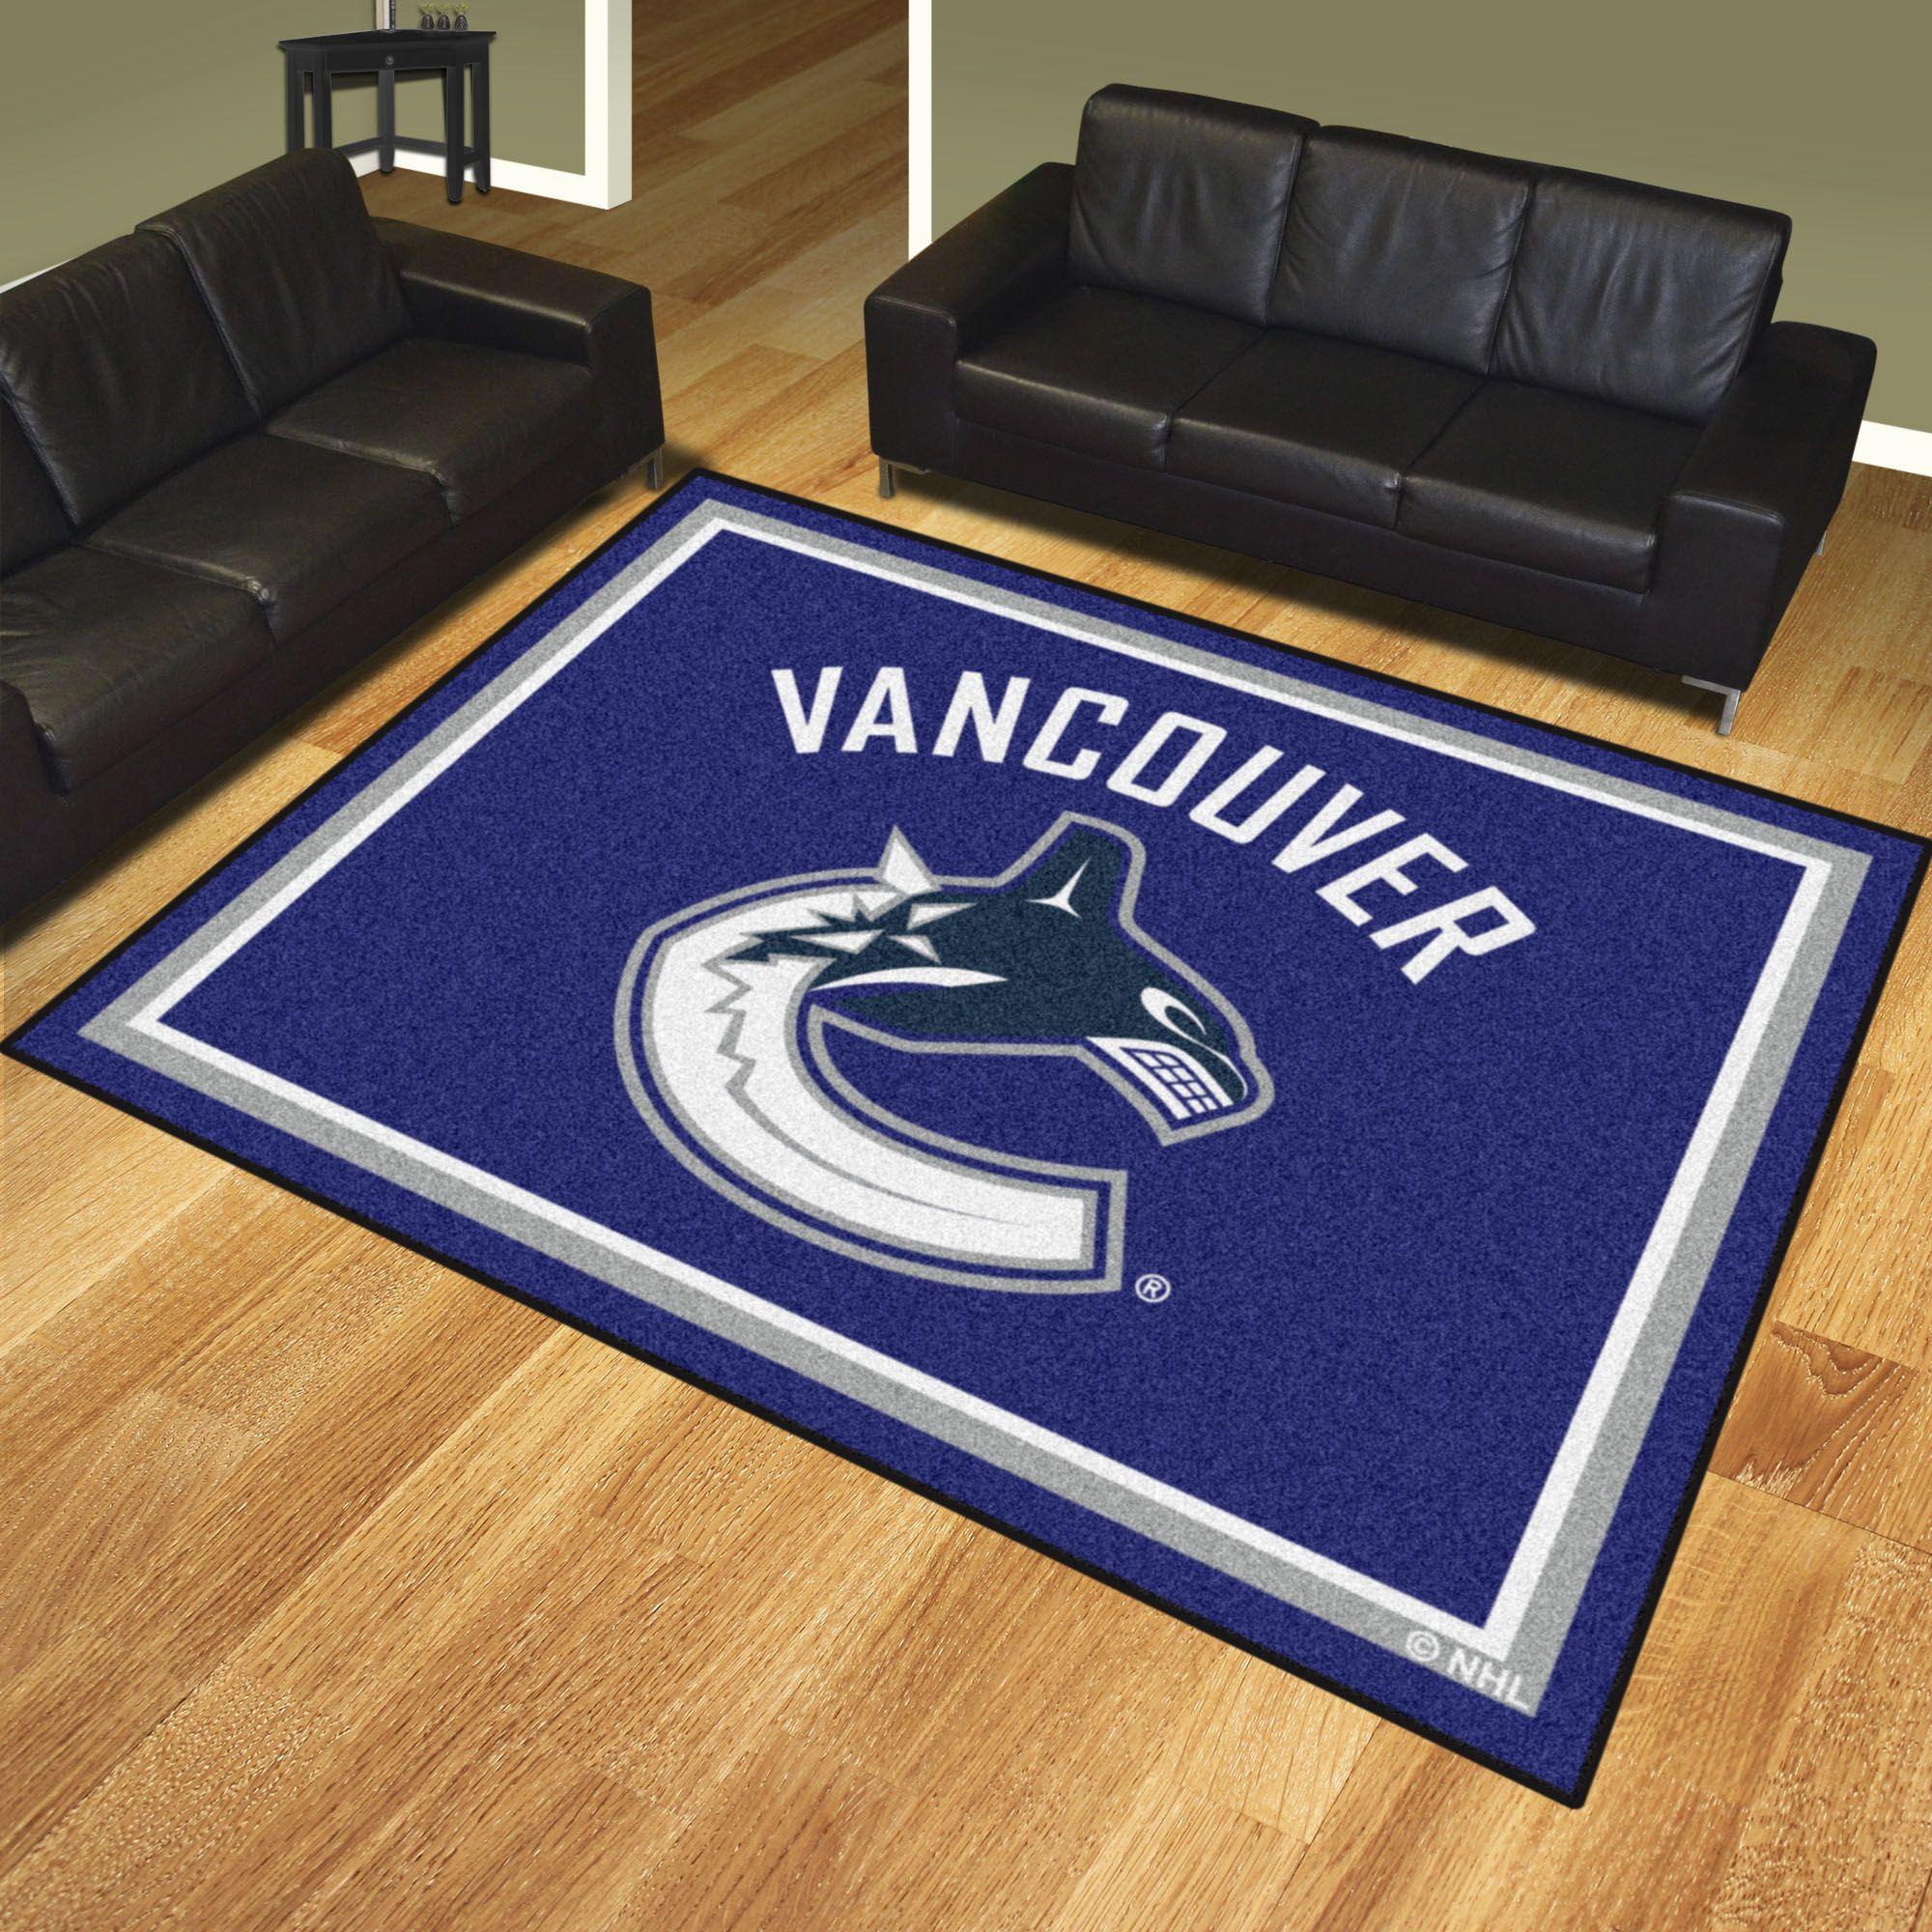 Vancouver Canucks 8x10 Rug